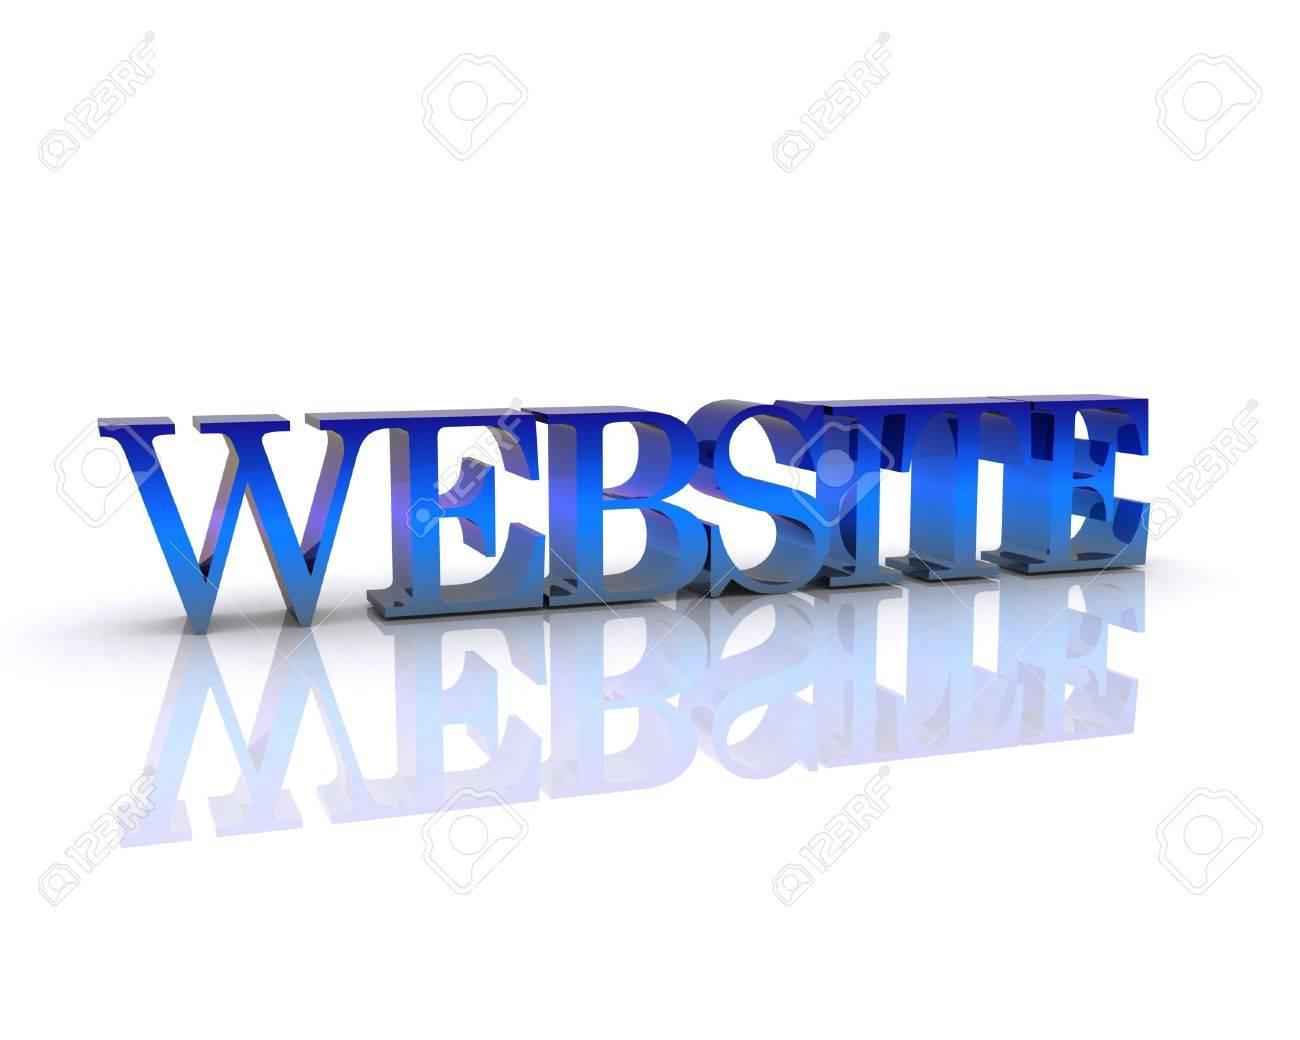 Website - 3D Stock Photo - 12467541